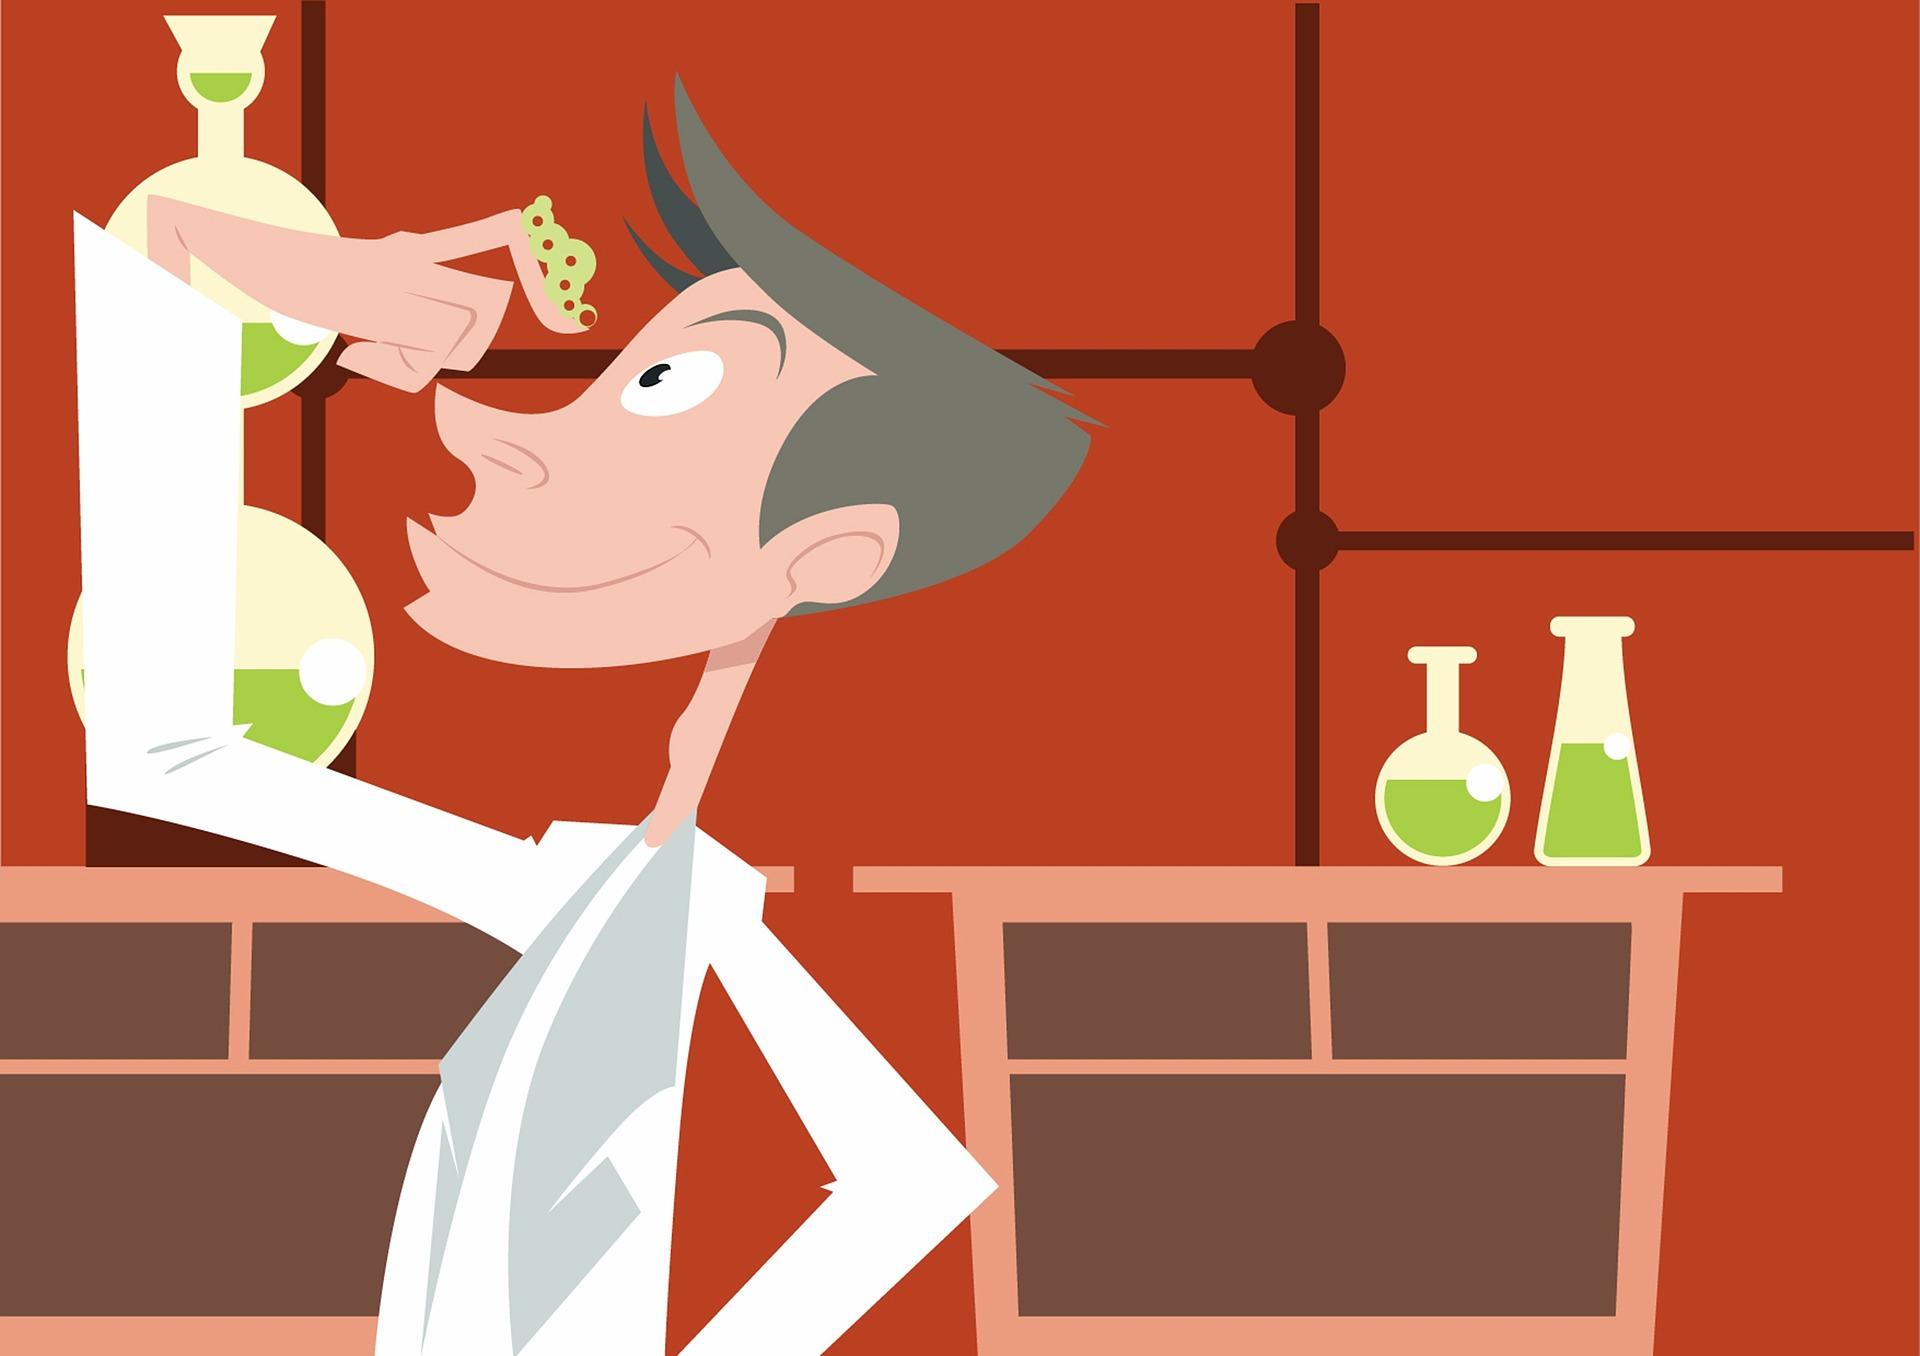 Wissenschaftler, Labor, Wurm, Reagenzglas, Bata - Wallpaper HD - Prof.-falken.com